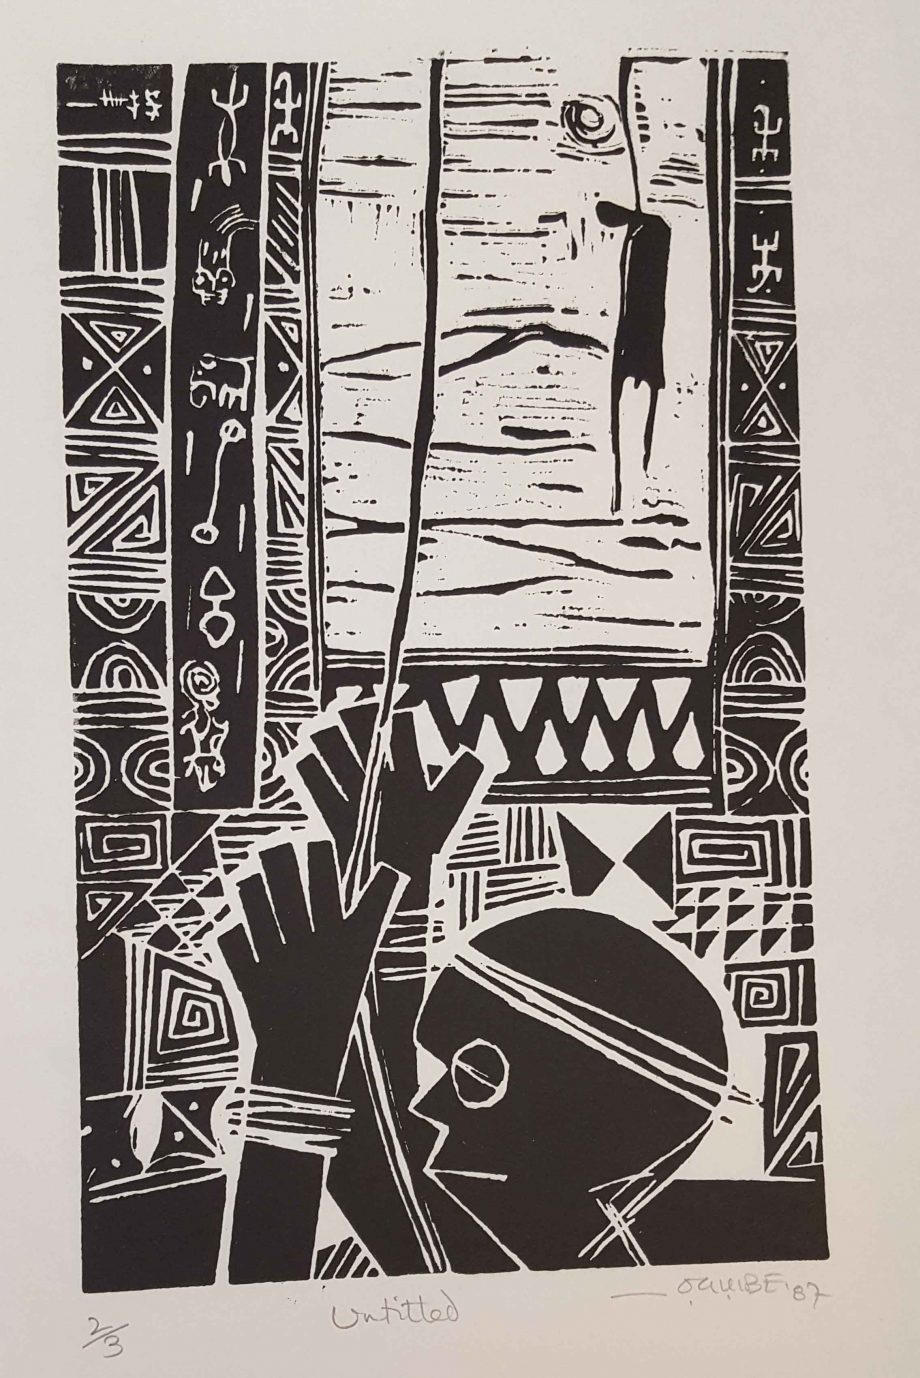 Untitled, 1987. Woodcut